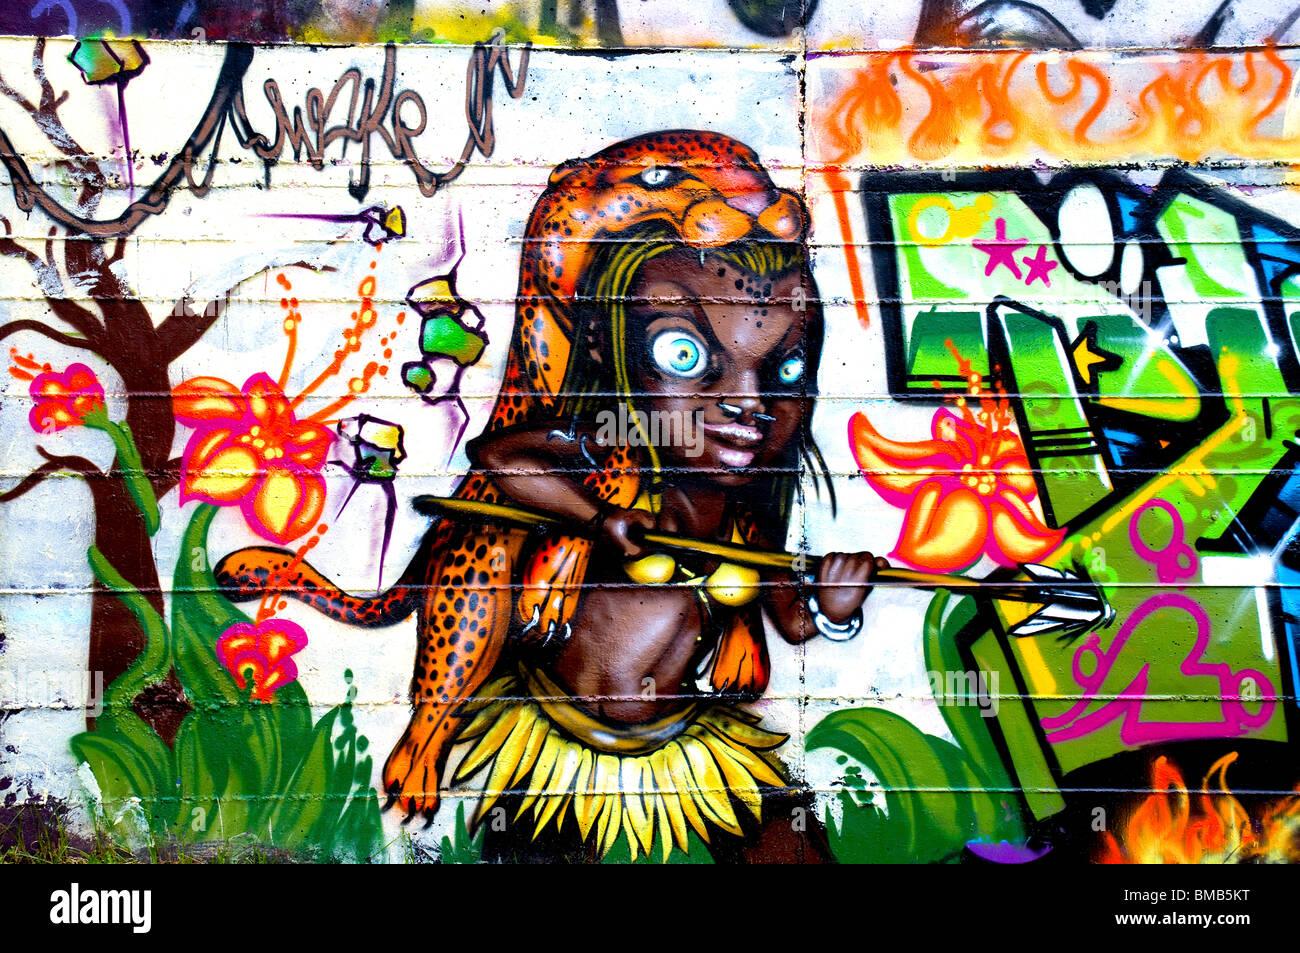 Mad savage graffiti - Stock Image